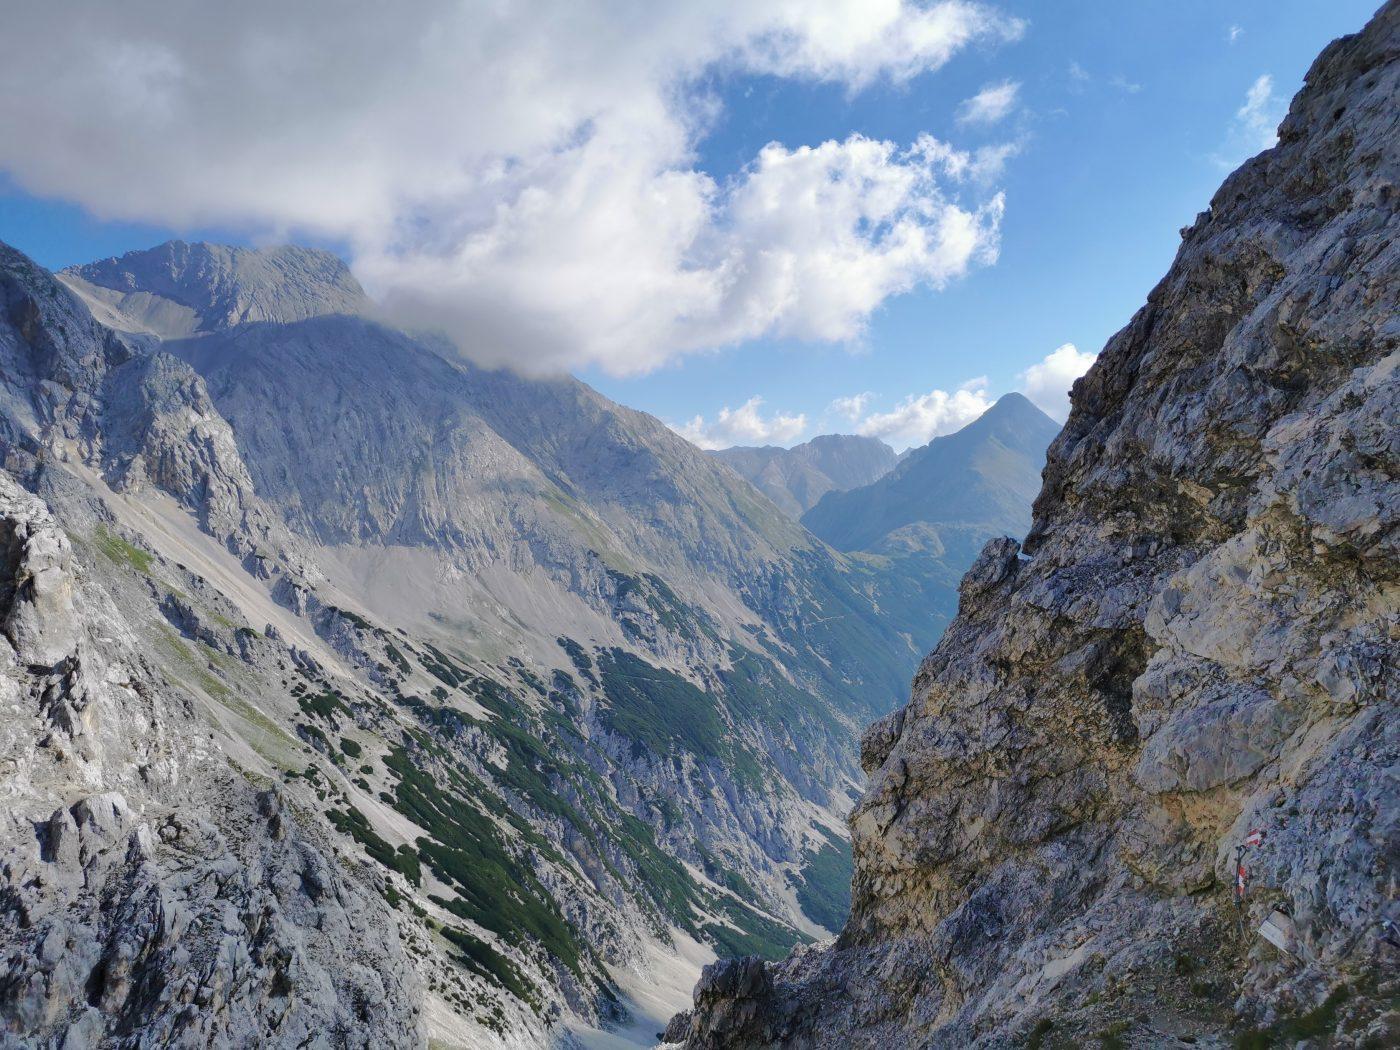 Bergtour_Kreuzjöchl - Stempljoch - Karwendel